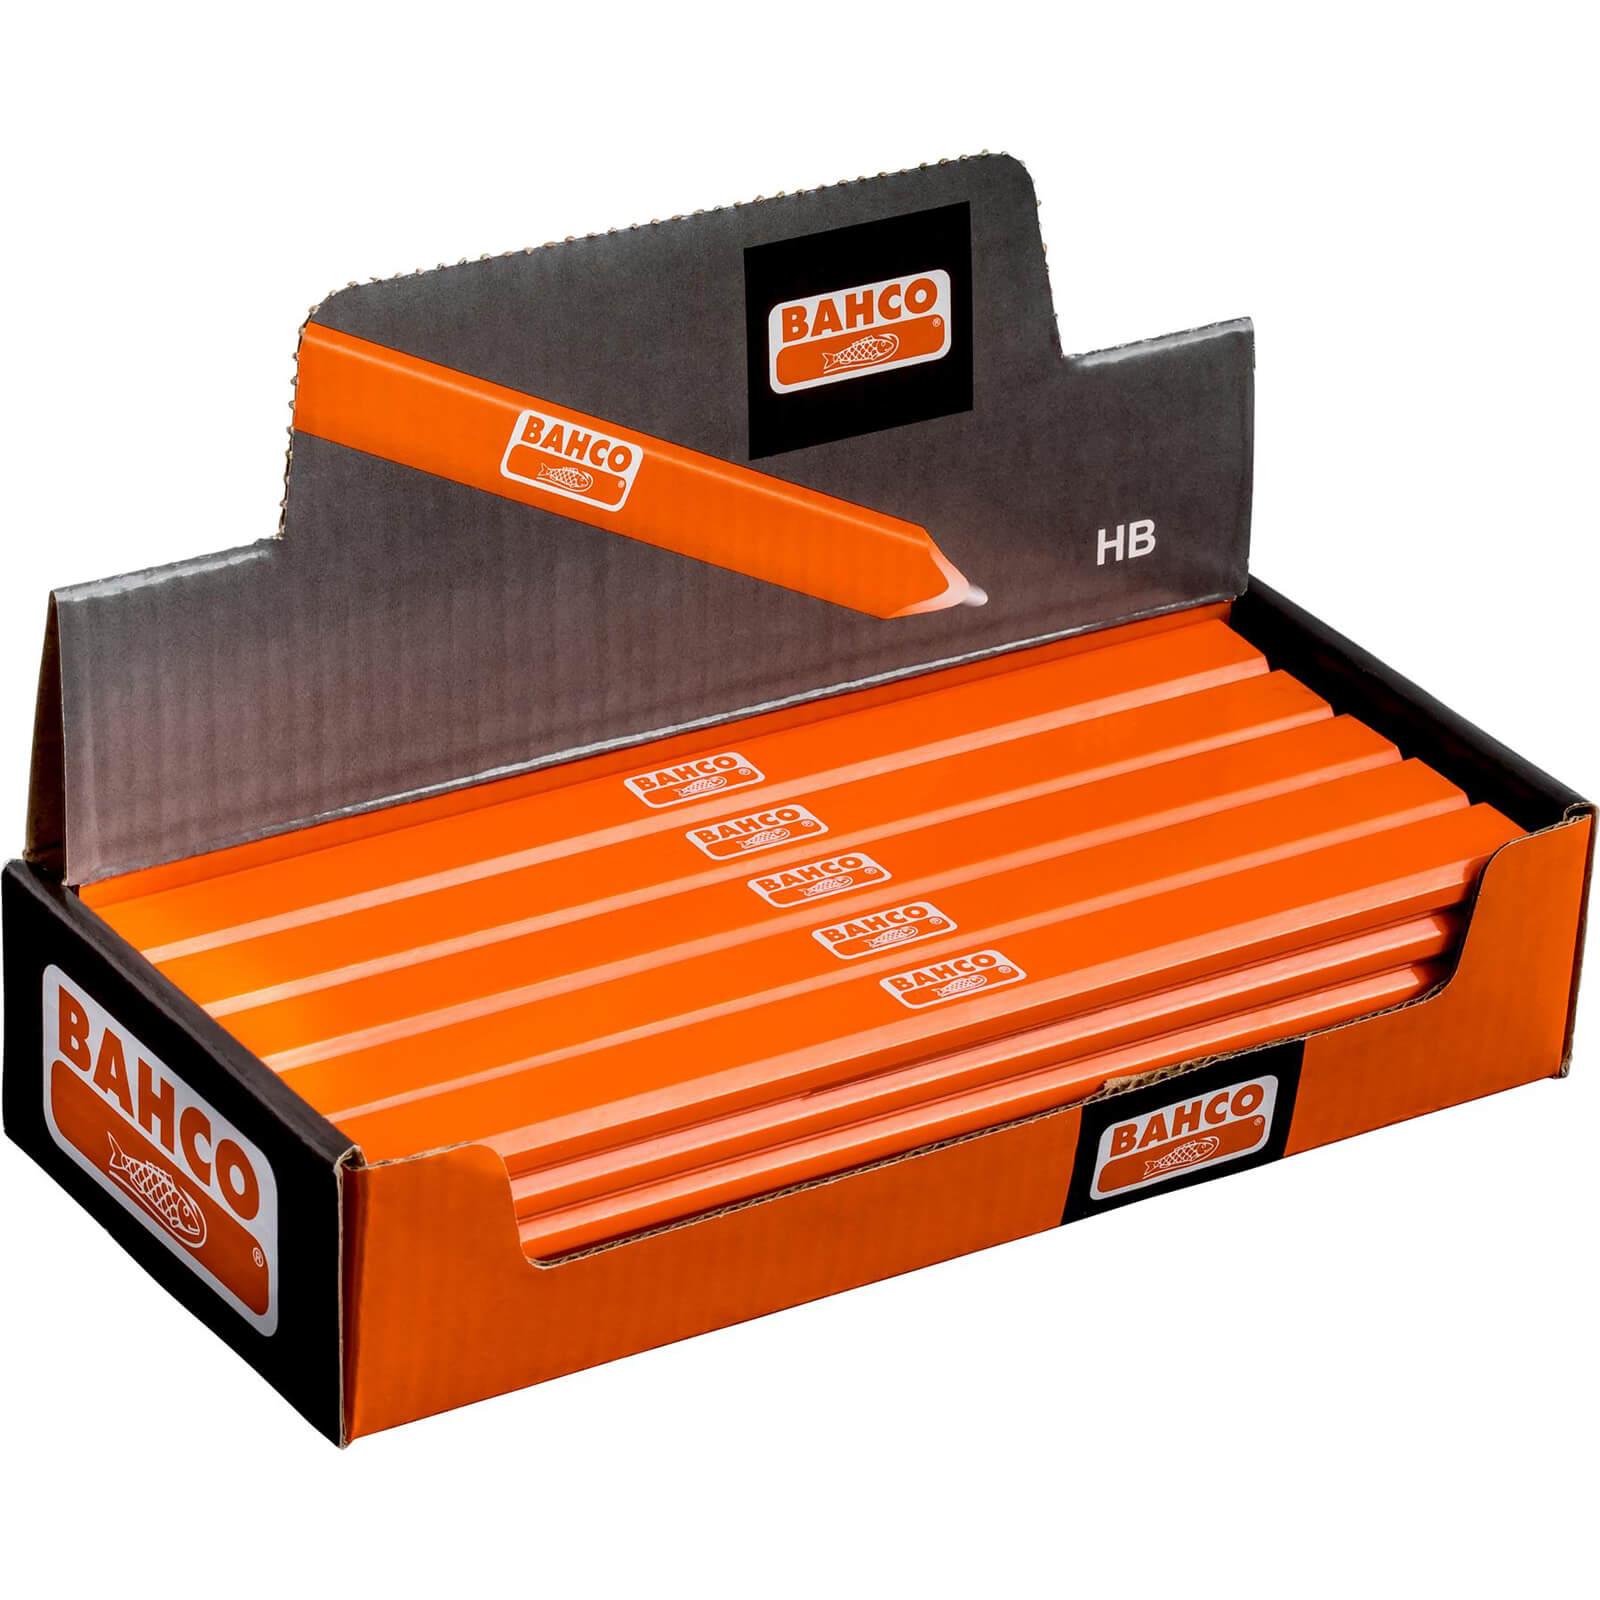 Image of Bahco HB Grade Carpenters Pencils Pack of 25